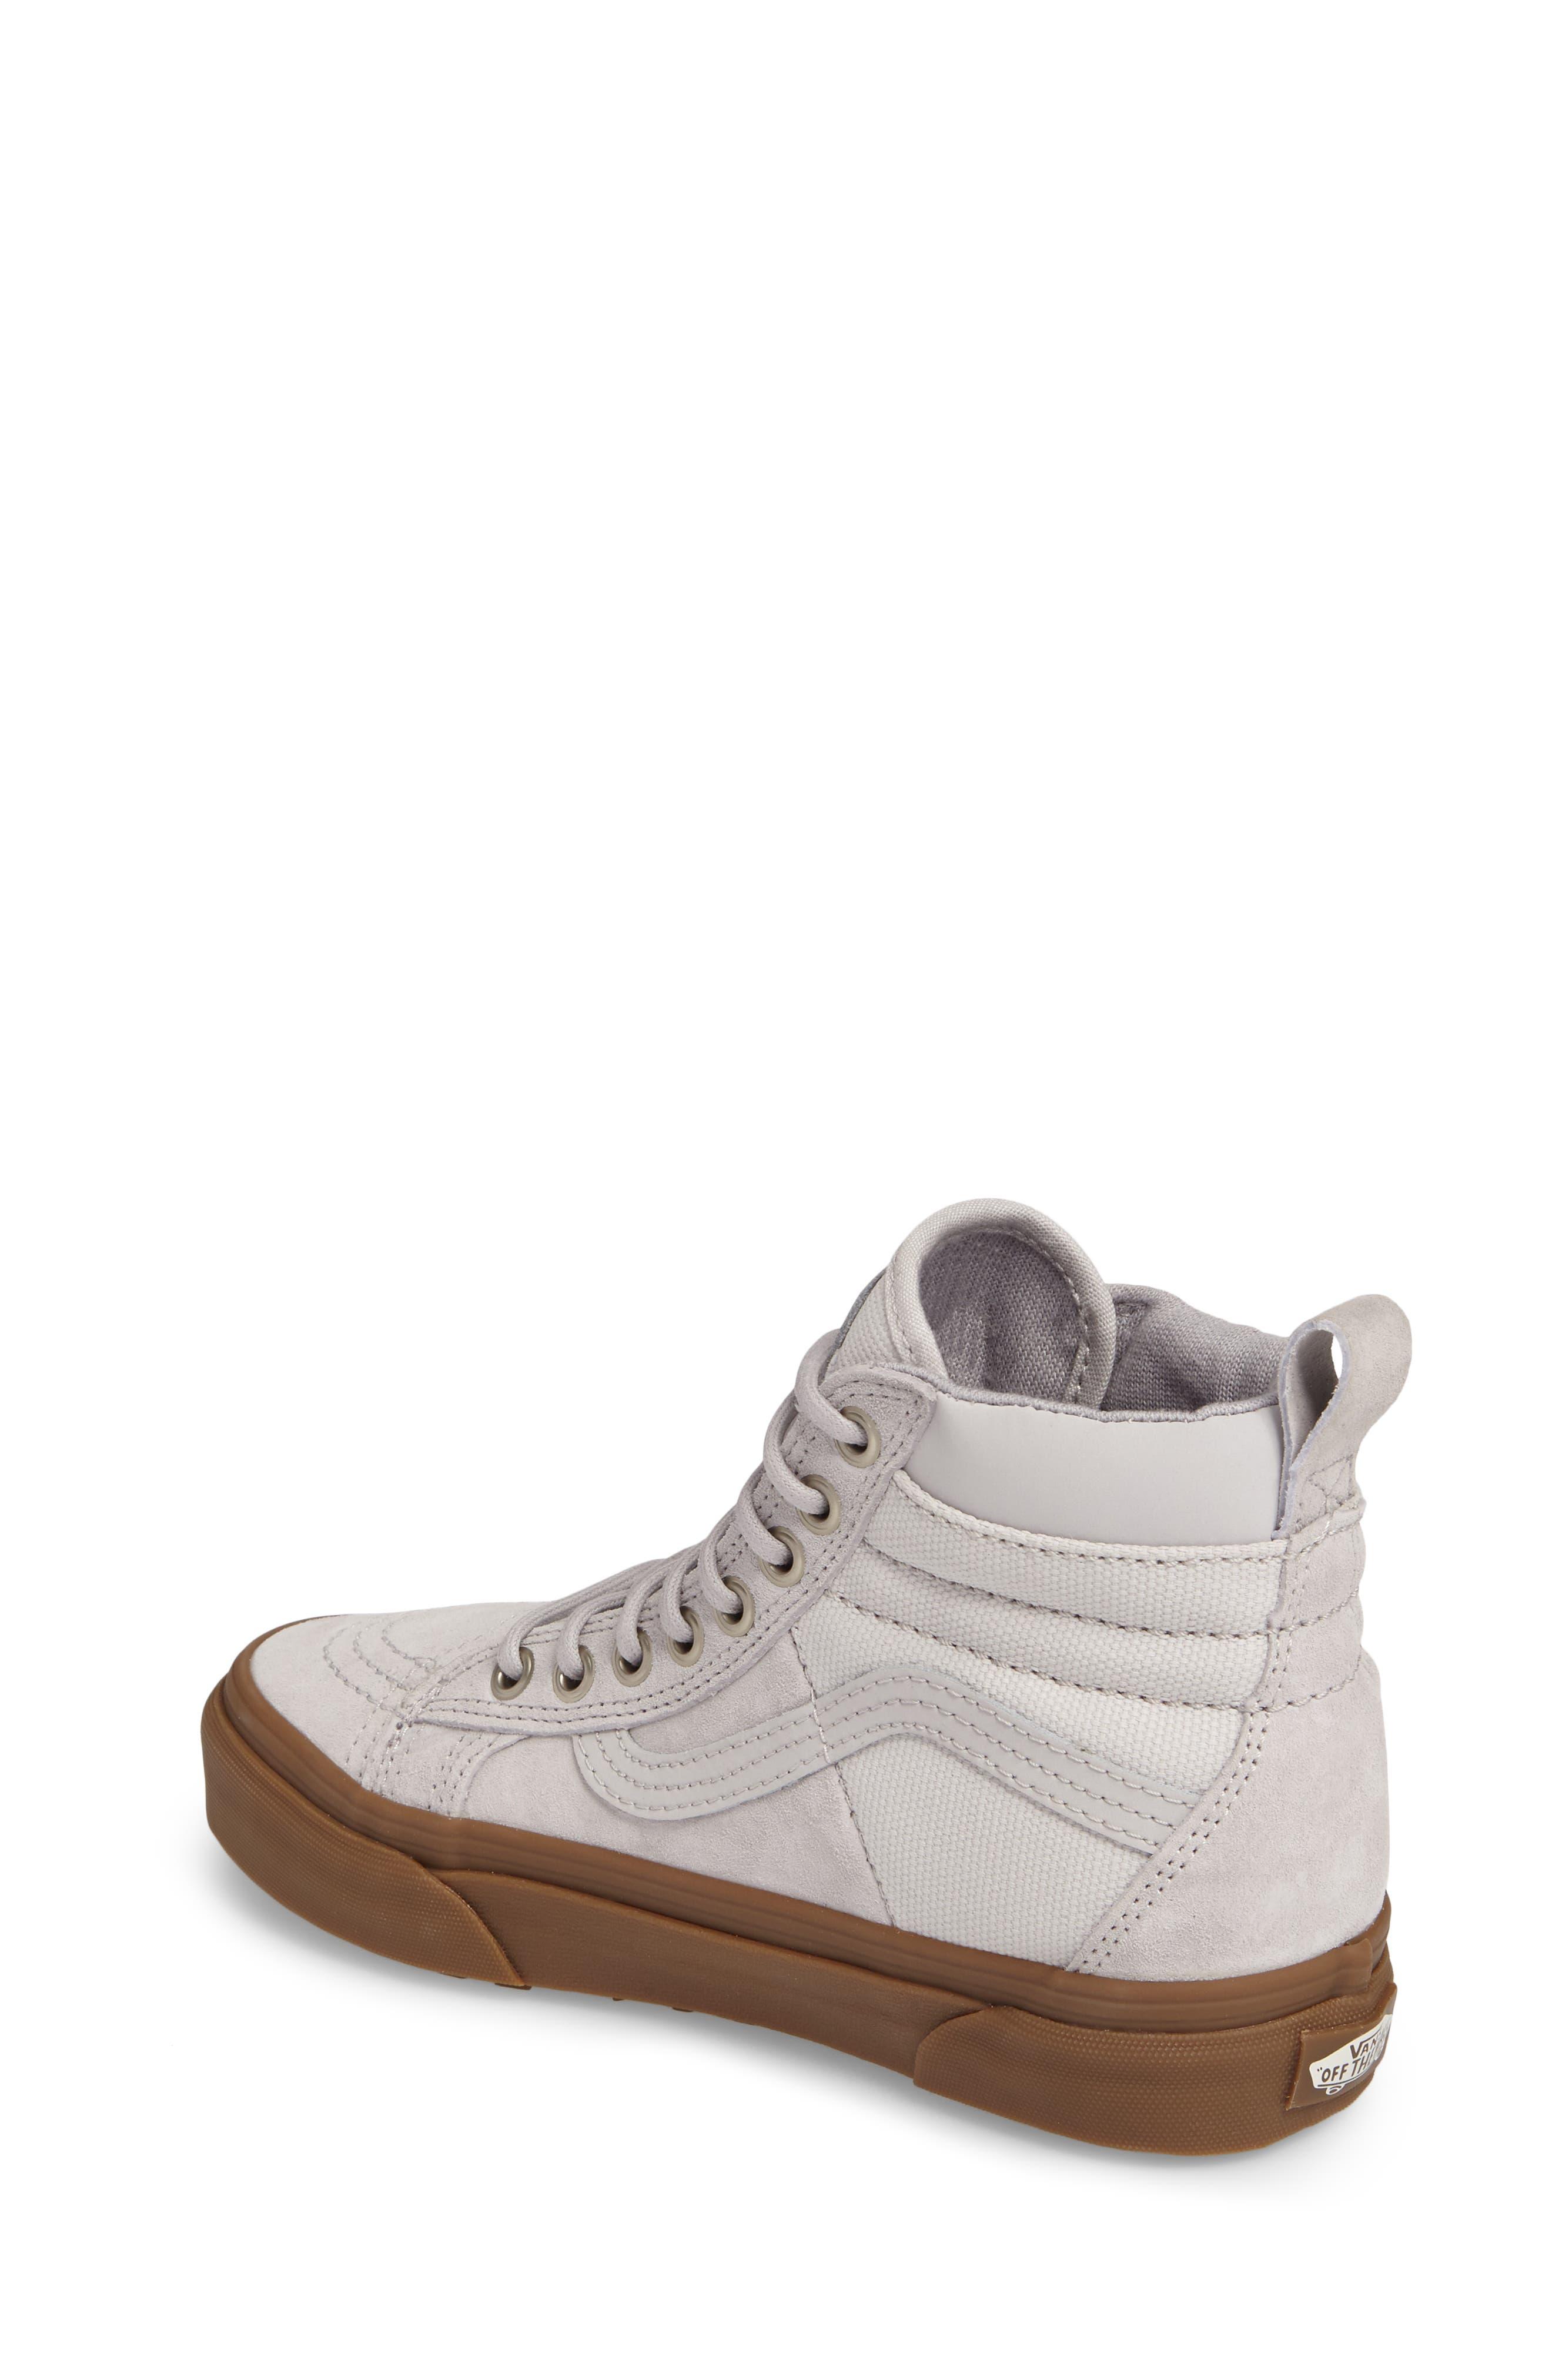 Sk8-Hi 46 MTE DX Sneaker,                             Alternate thumbnail 2, color,                             030